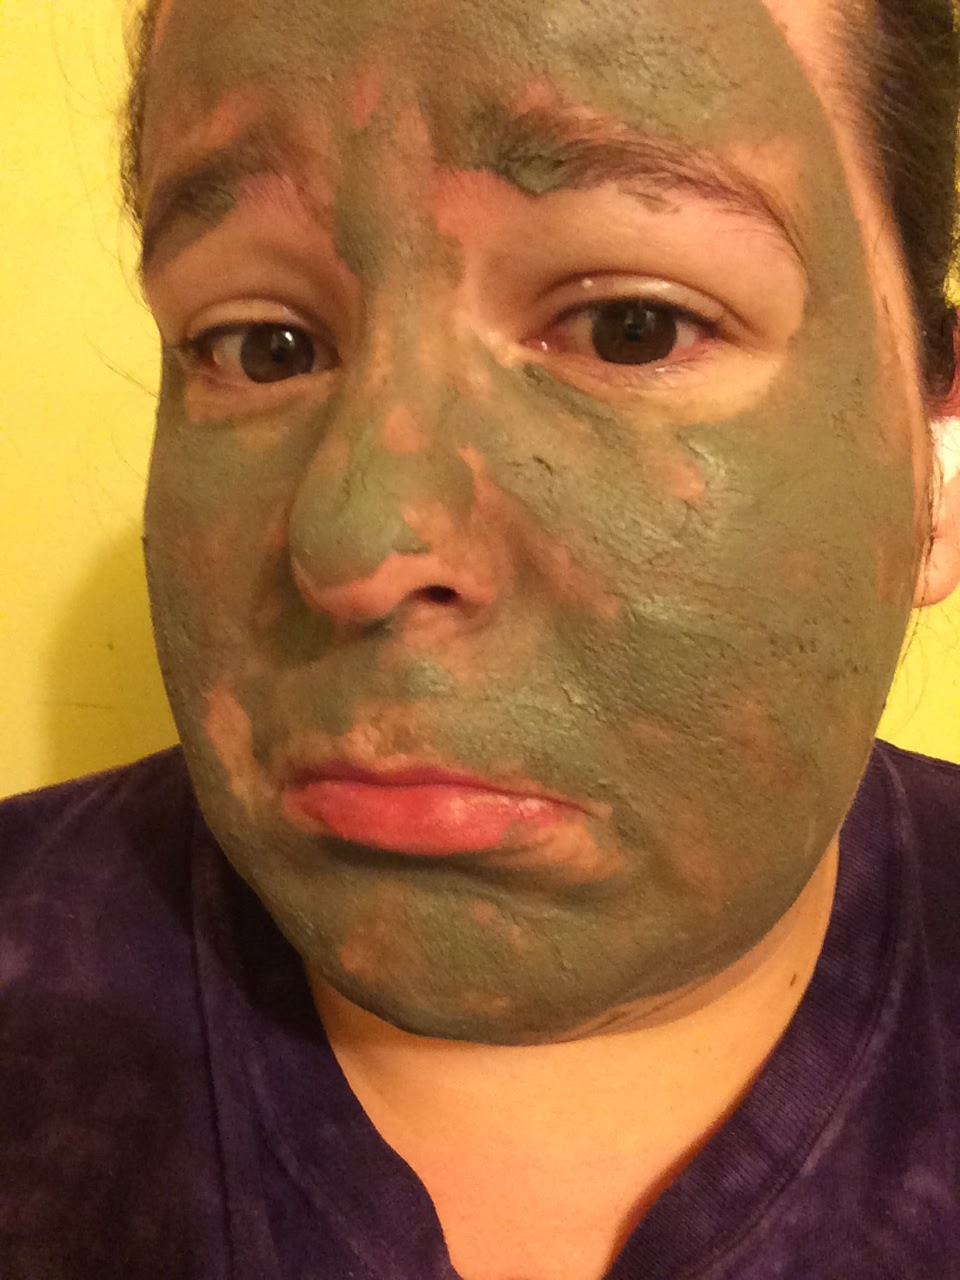 Adovia Purifying Mud Mask